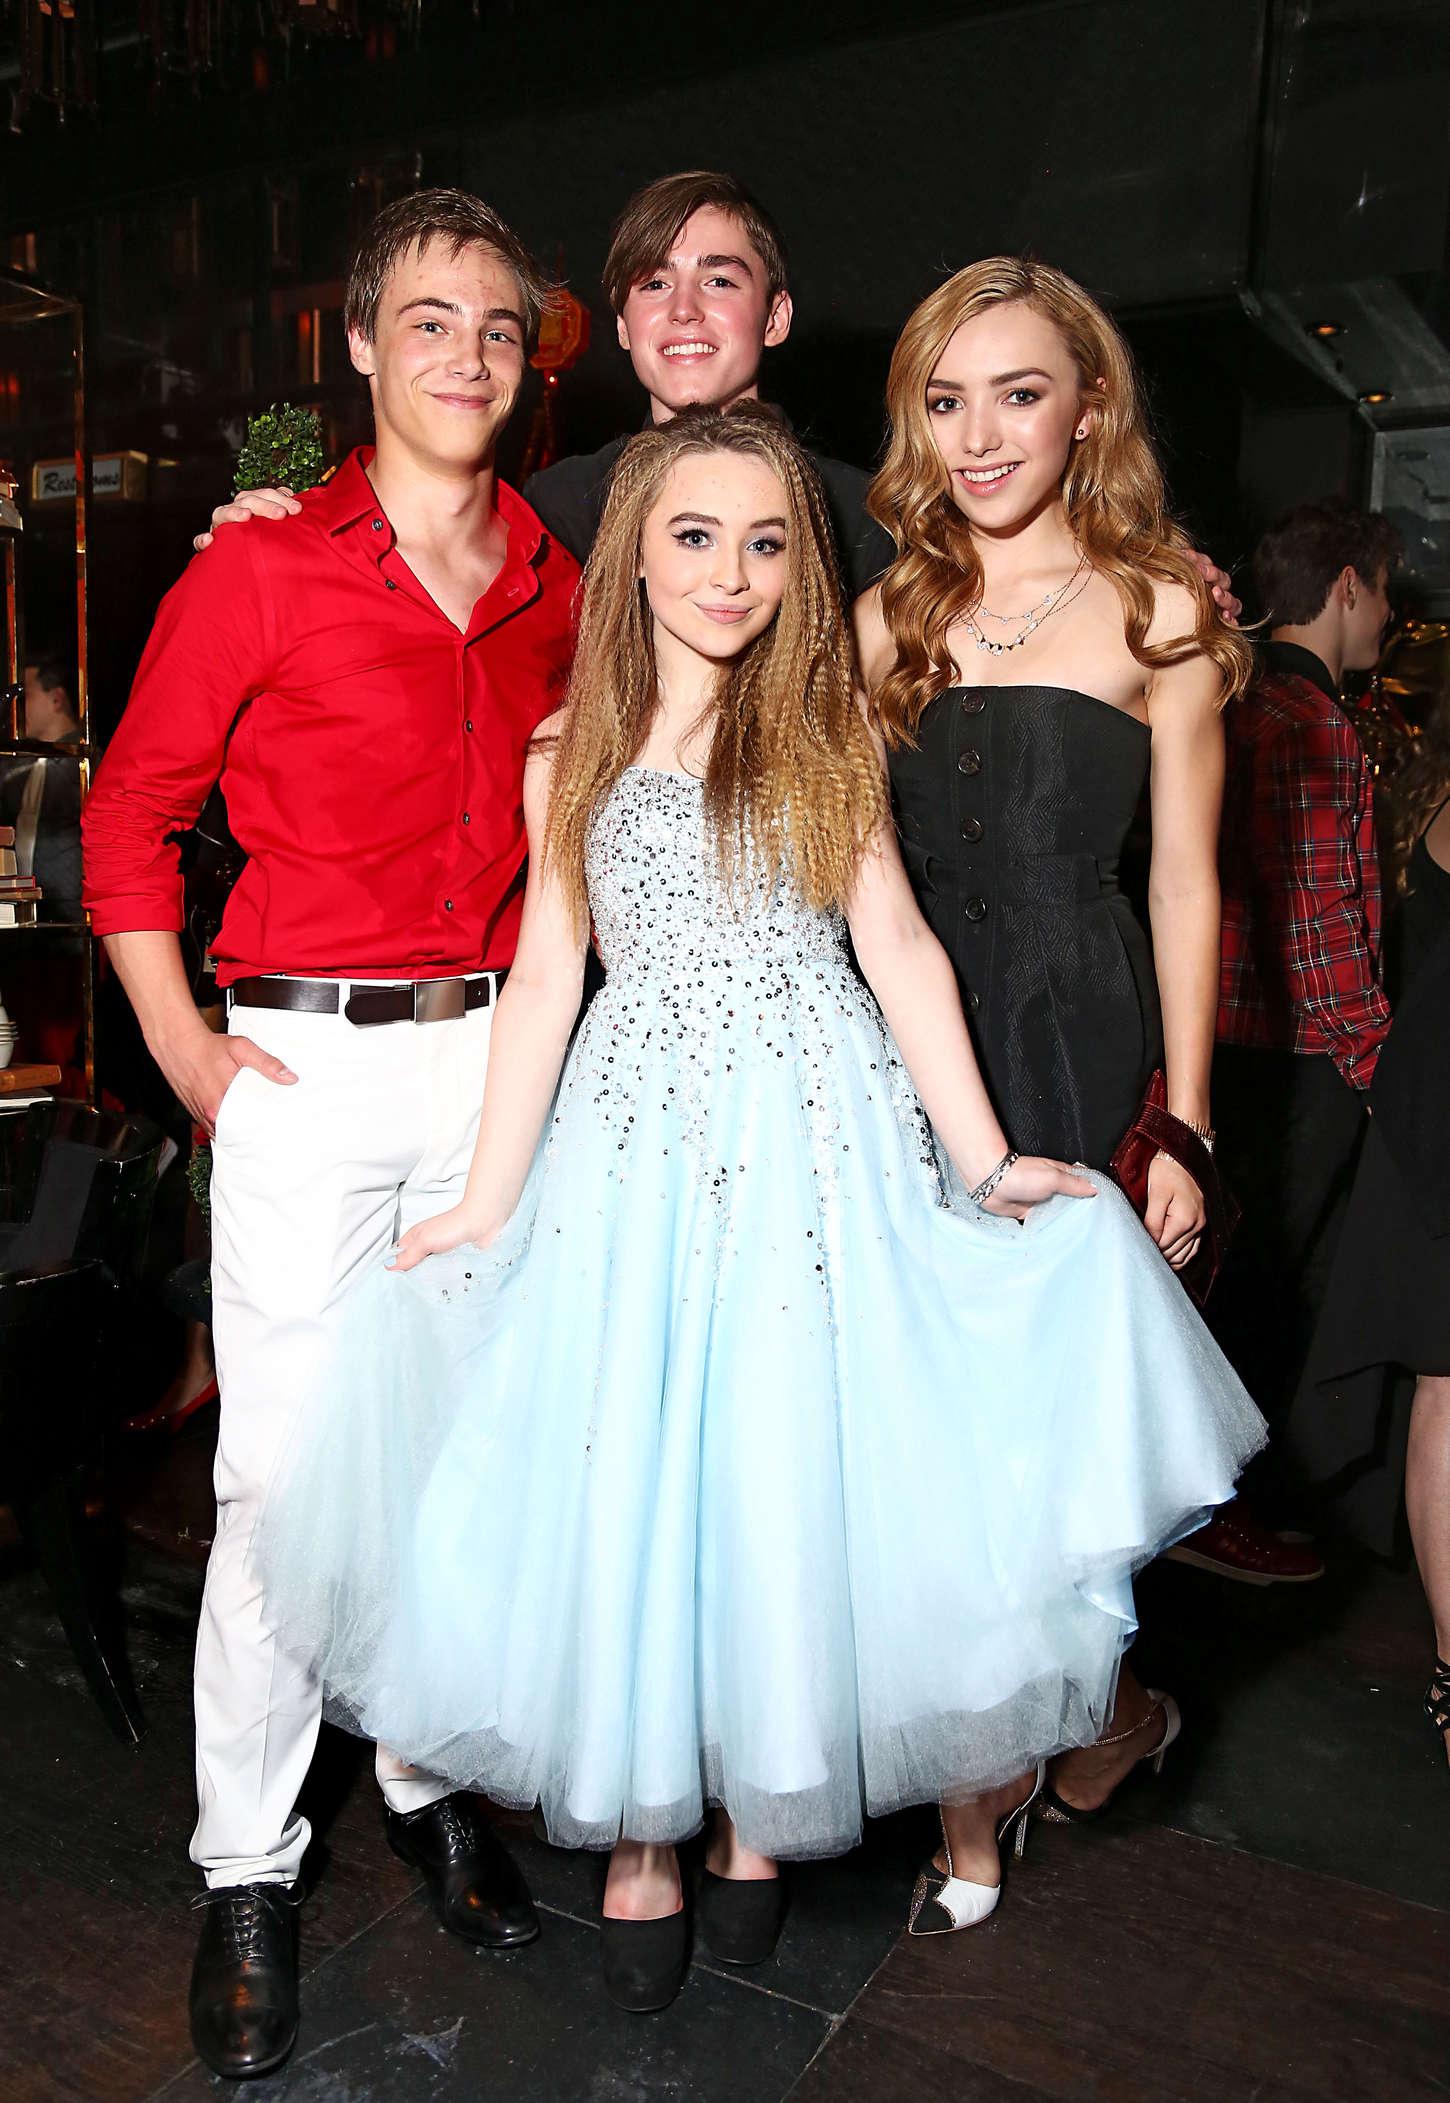 Sabrina Carpenter 2015 : Sabrina Carpenter: 16th Birthday Party -38